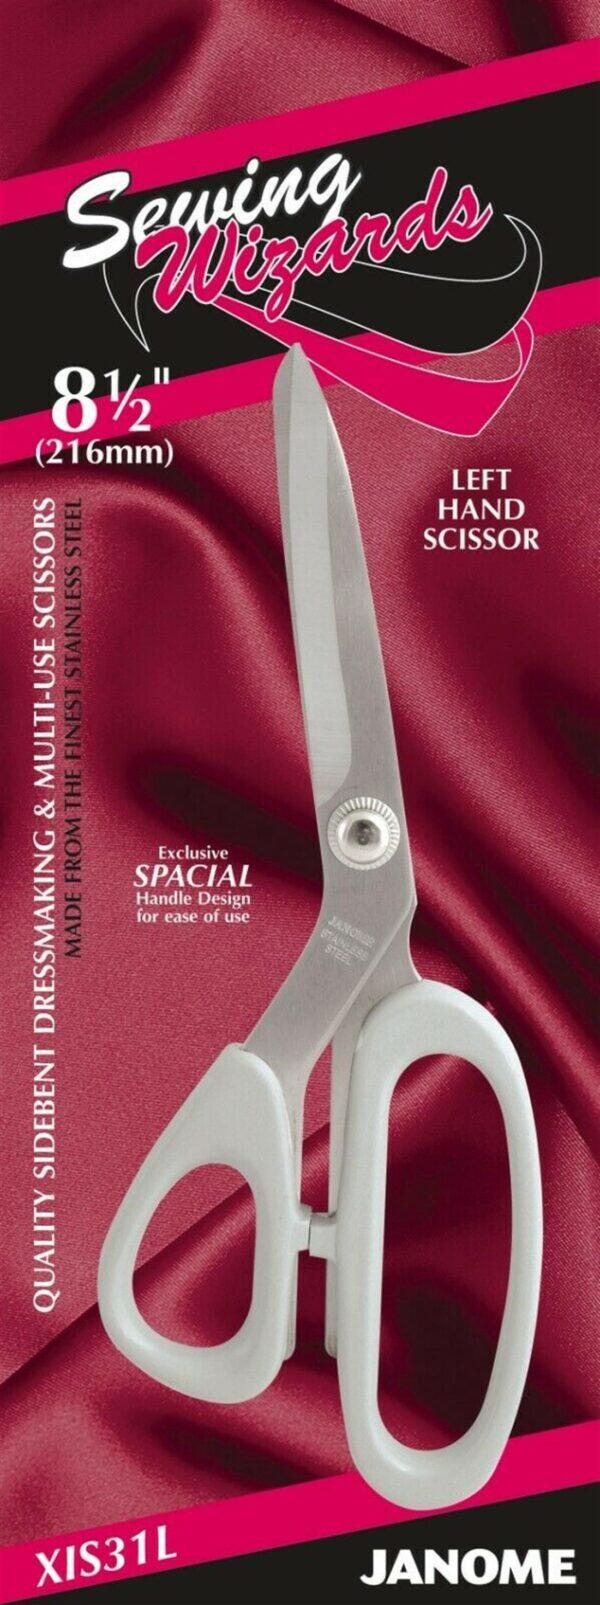 Janome left Hand Scissor